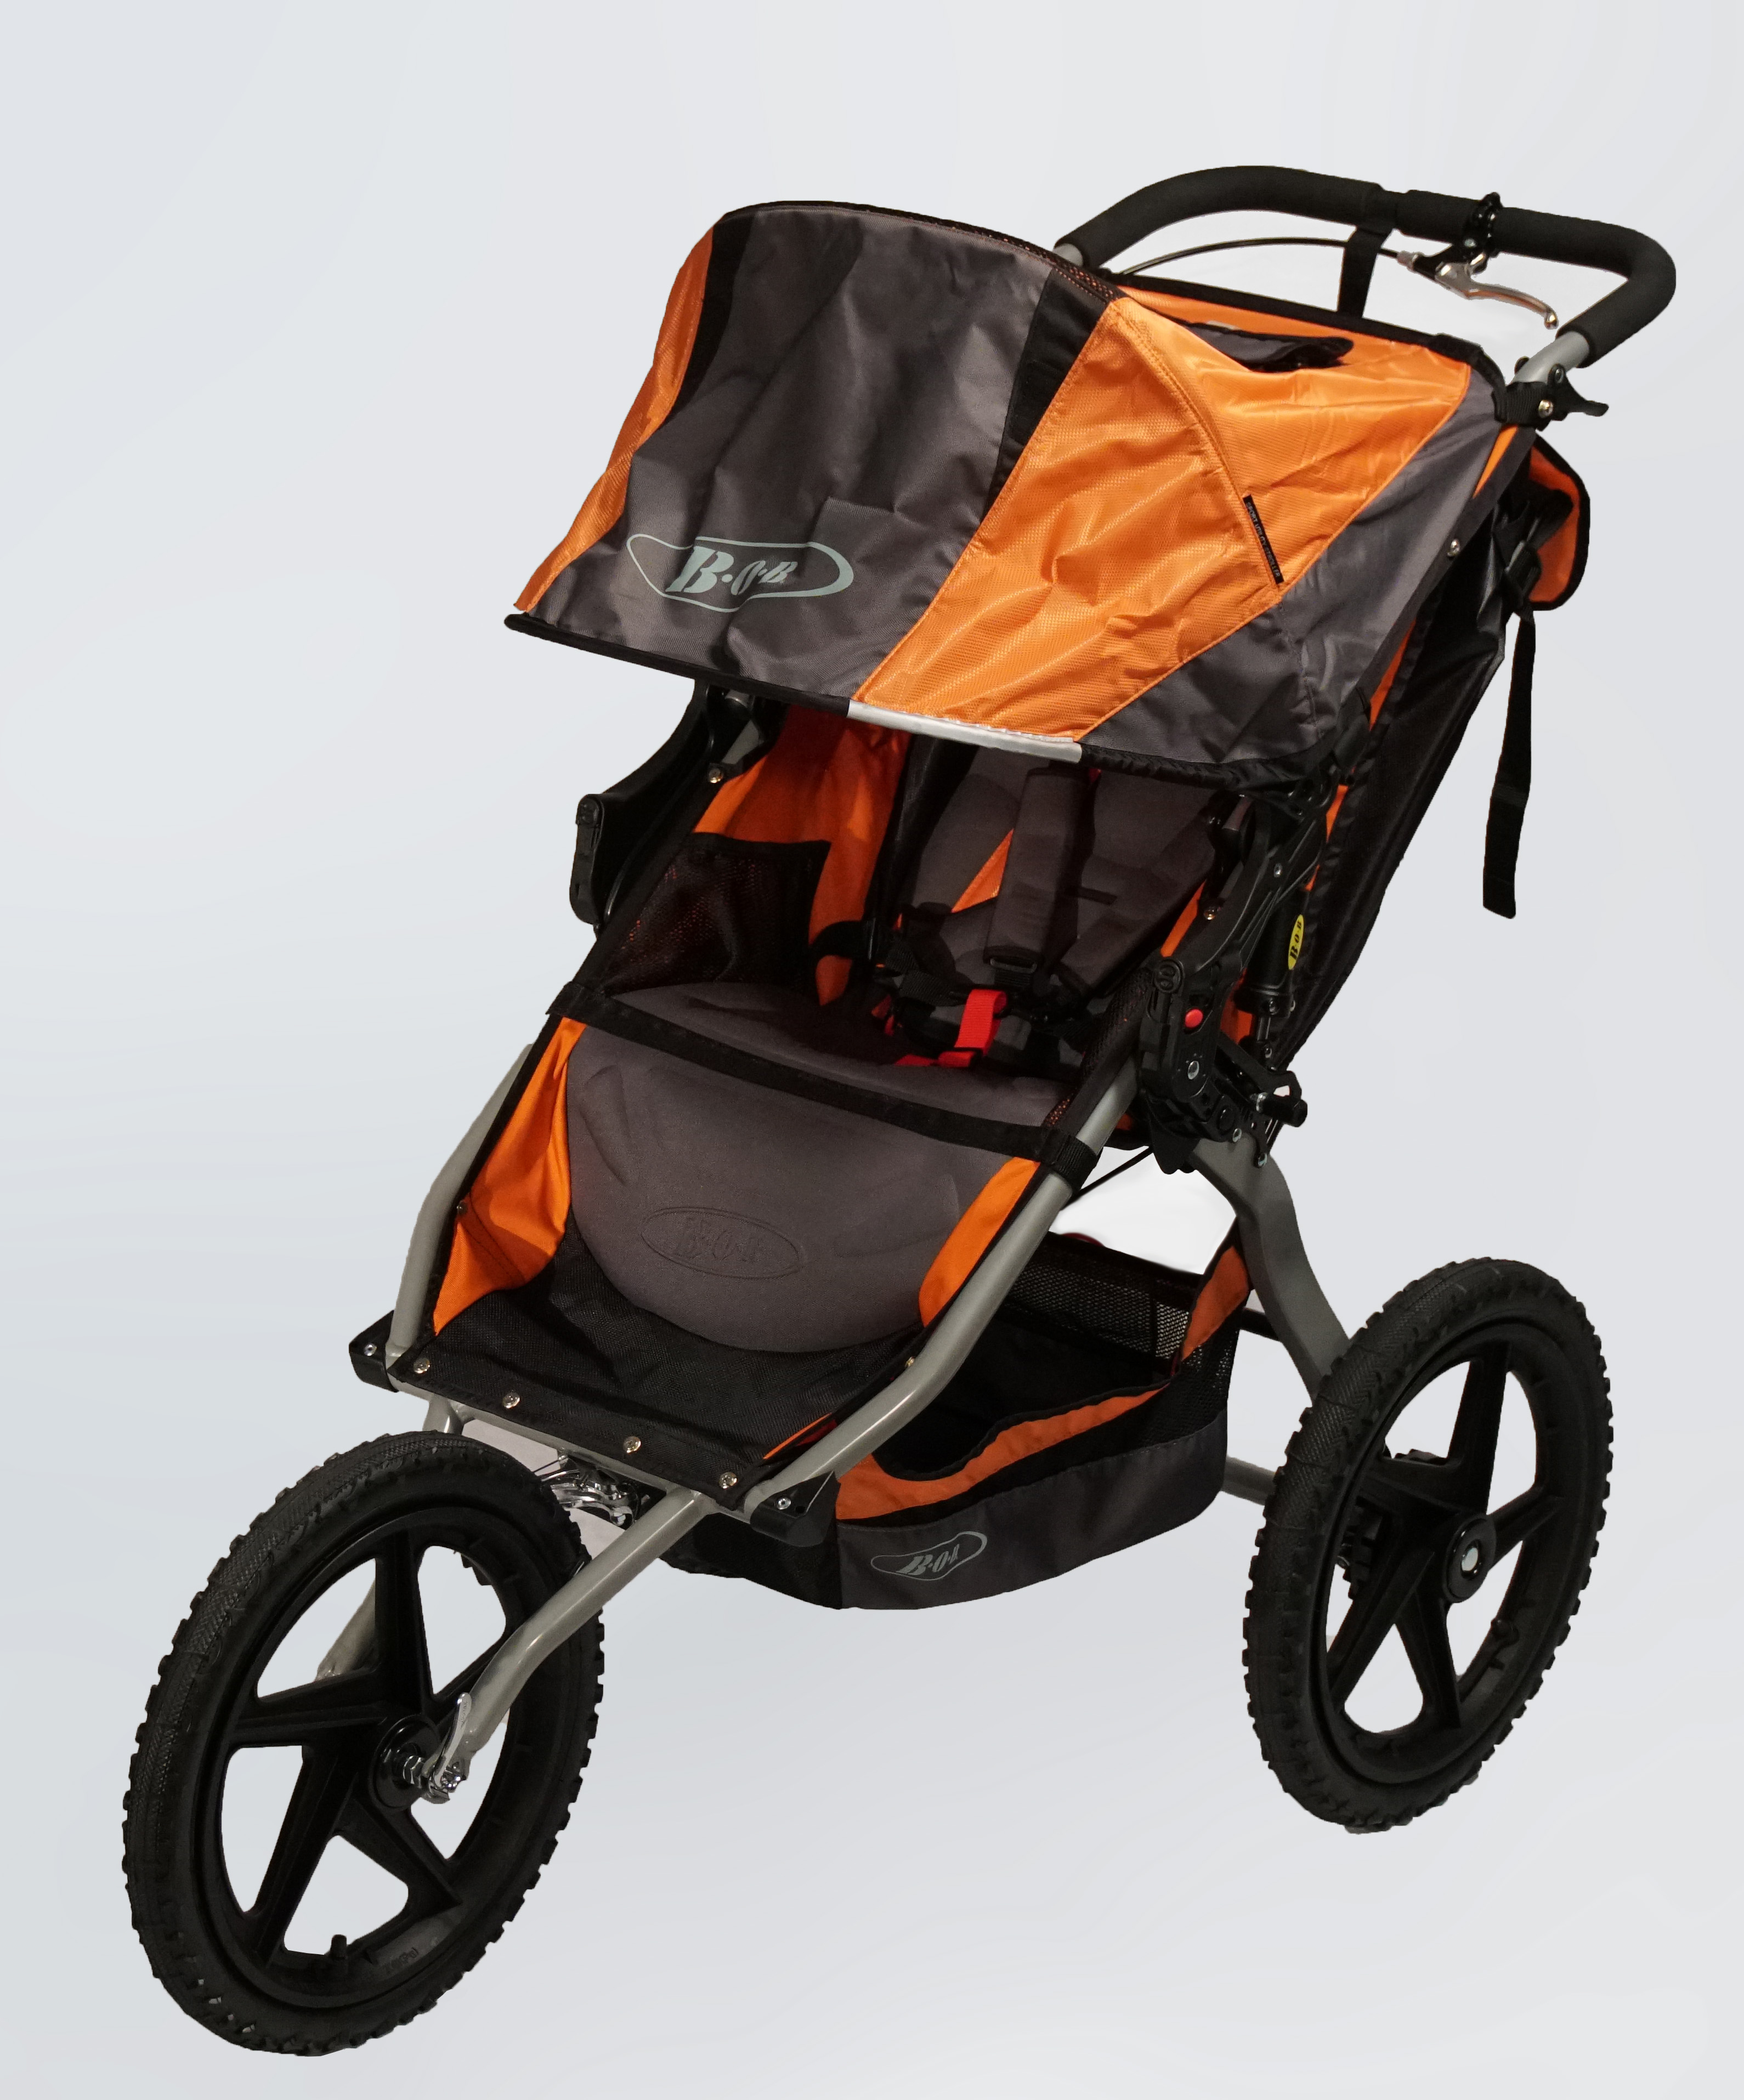 Britax B.O.B. jogging stroller